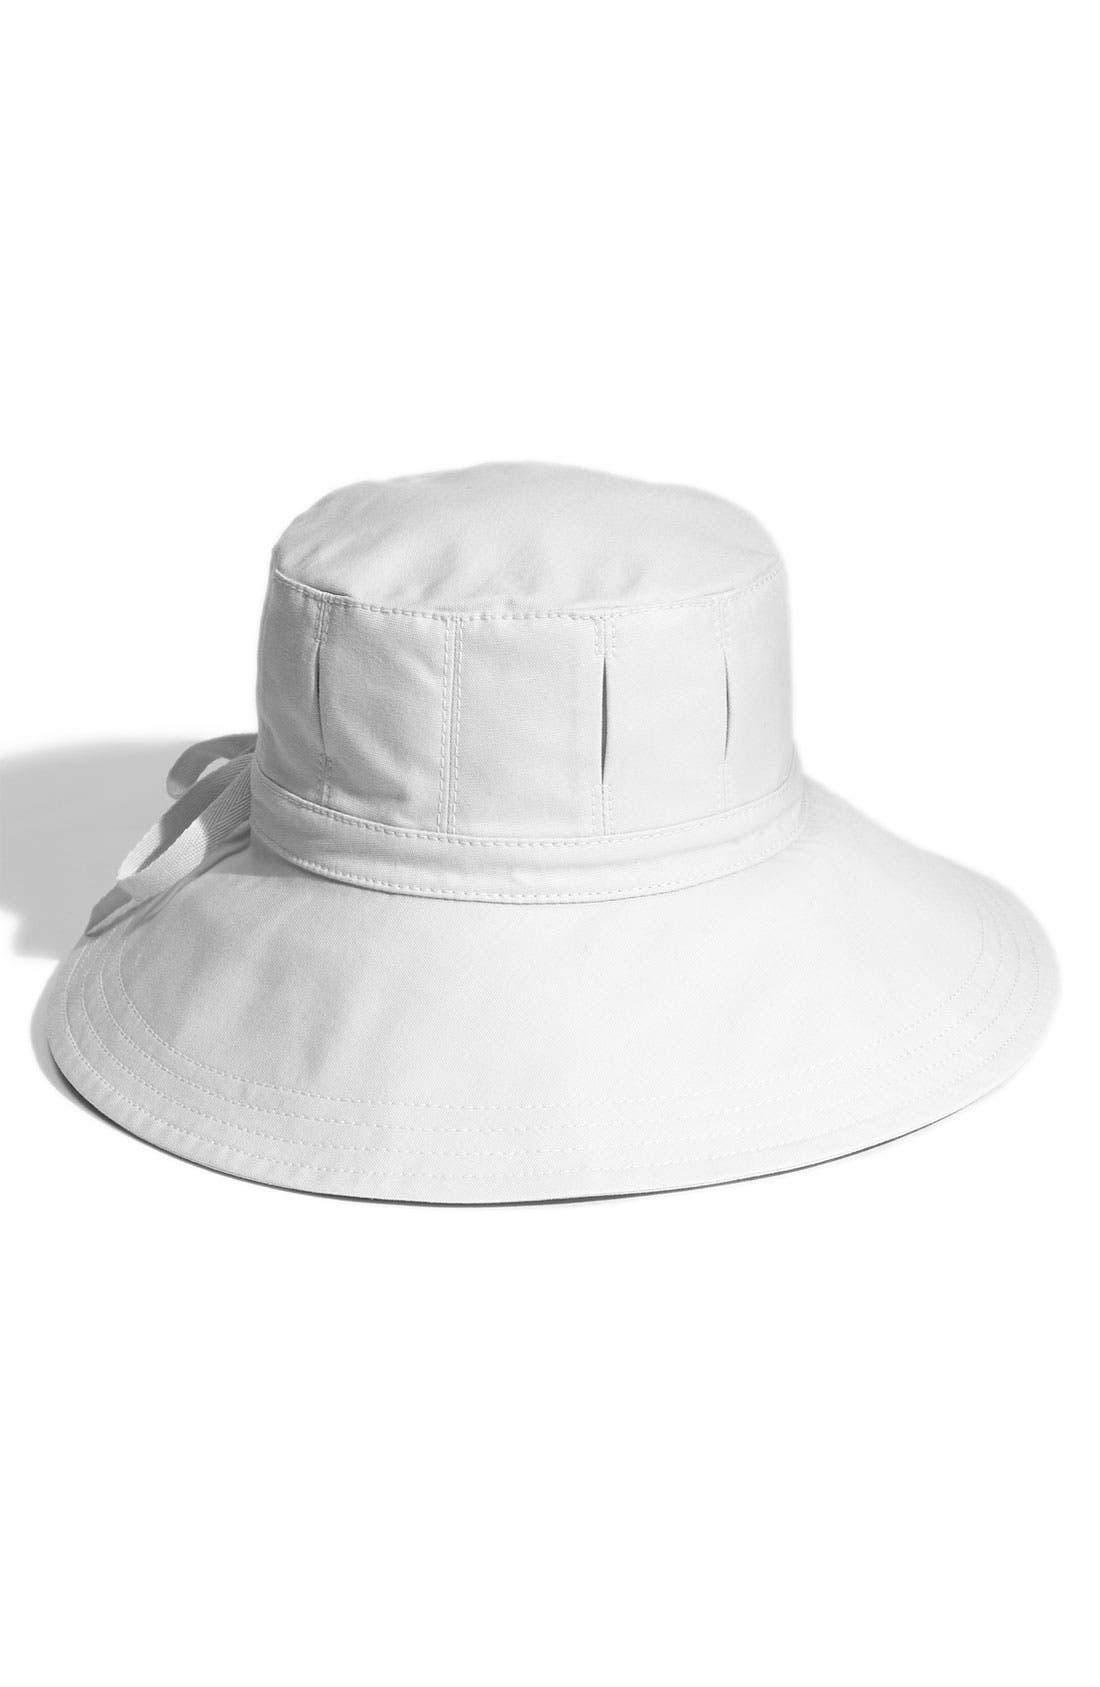 Alternate Image 1 Selected - Helen Kaminski 'Indira' Cotton Canvas Sun Hat